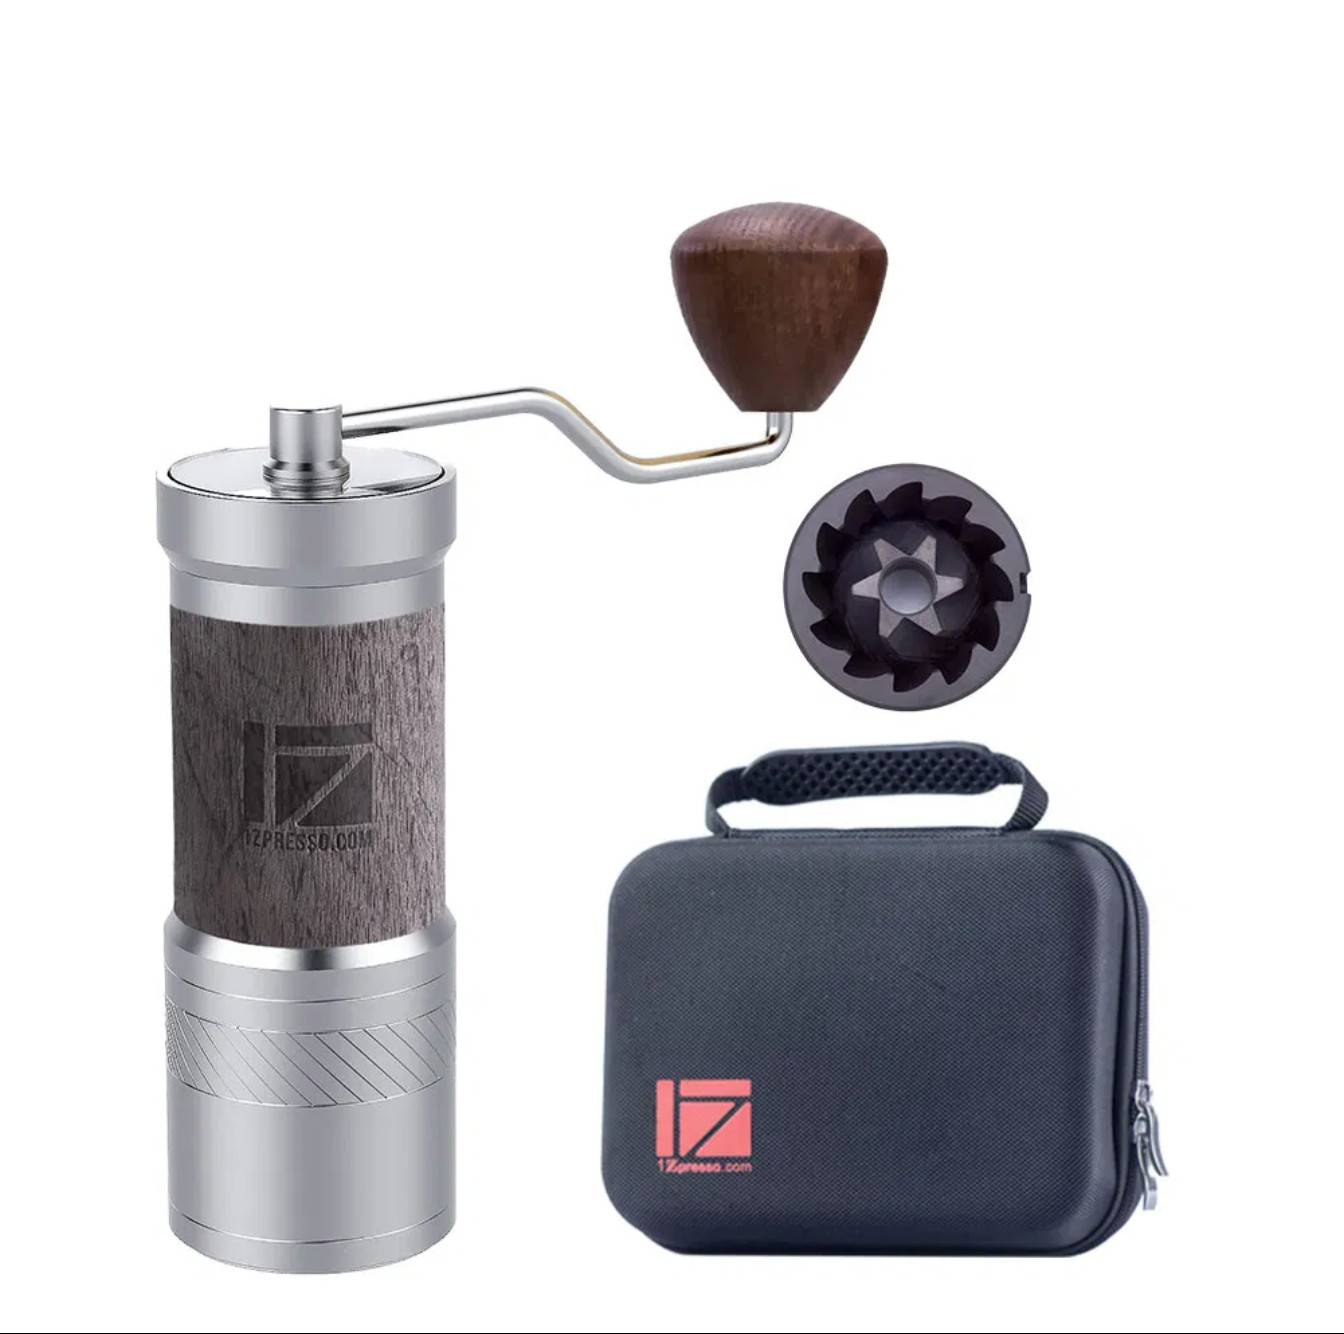 Kaffebox 1Zpresso JE-plus Coffee Grinder